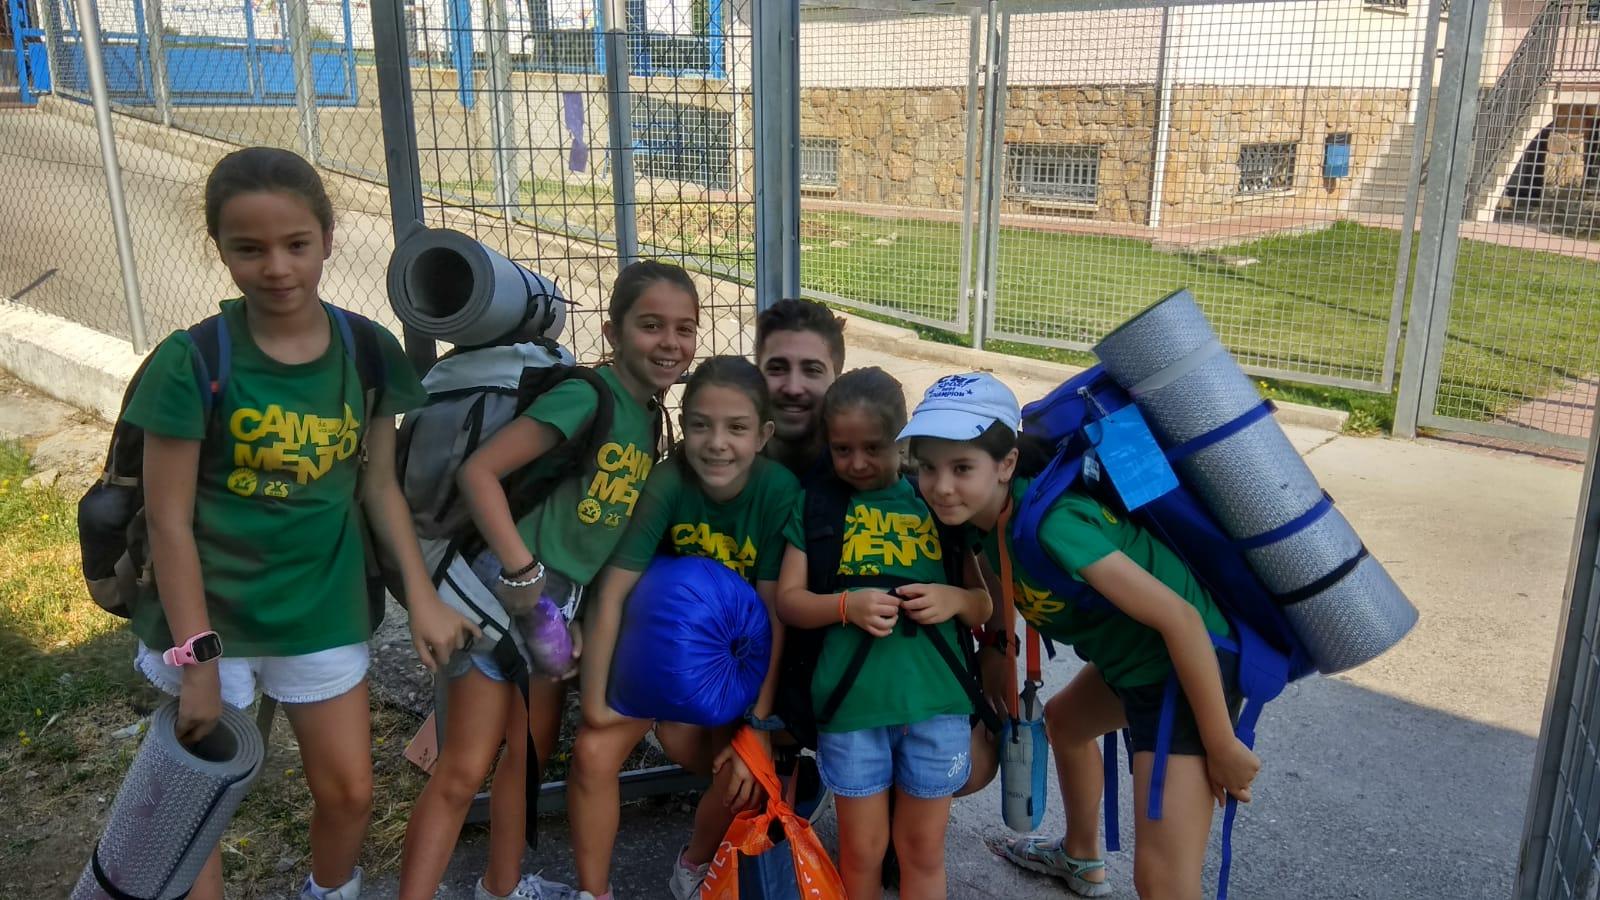 Campamento Villalkor - (2)